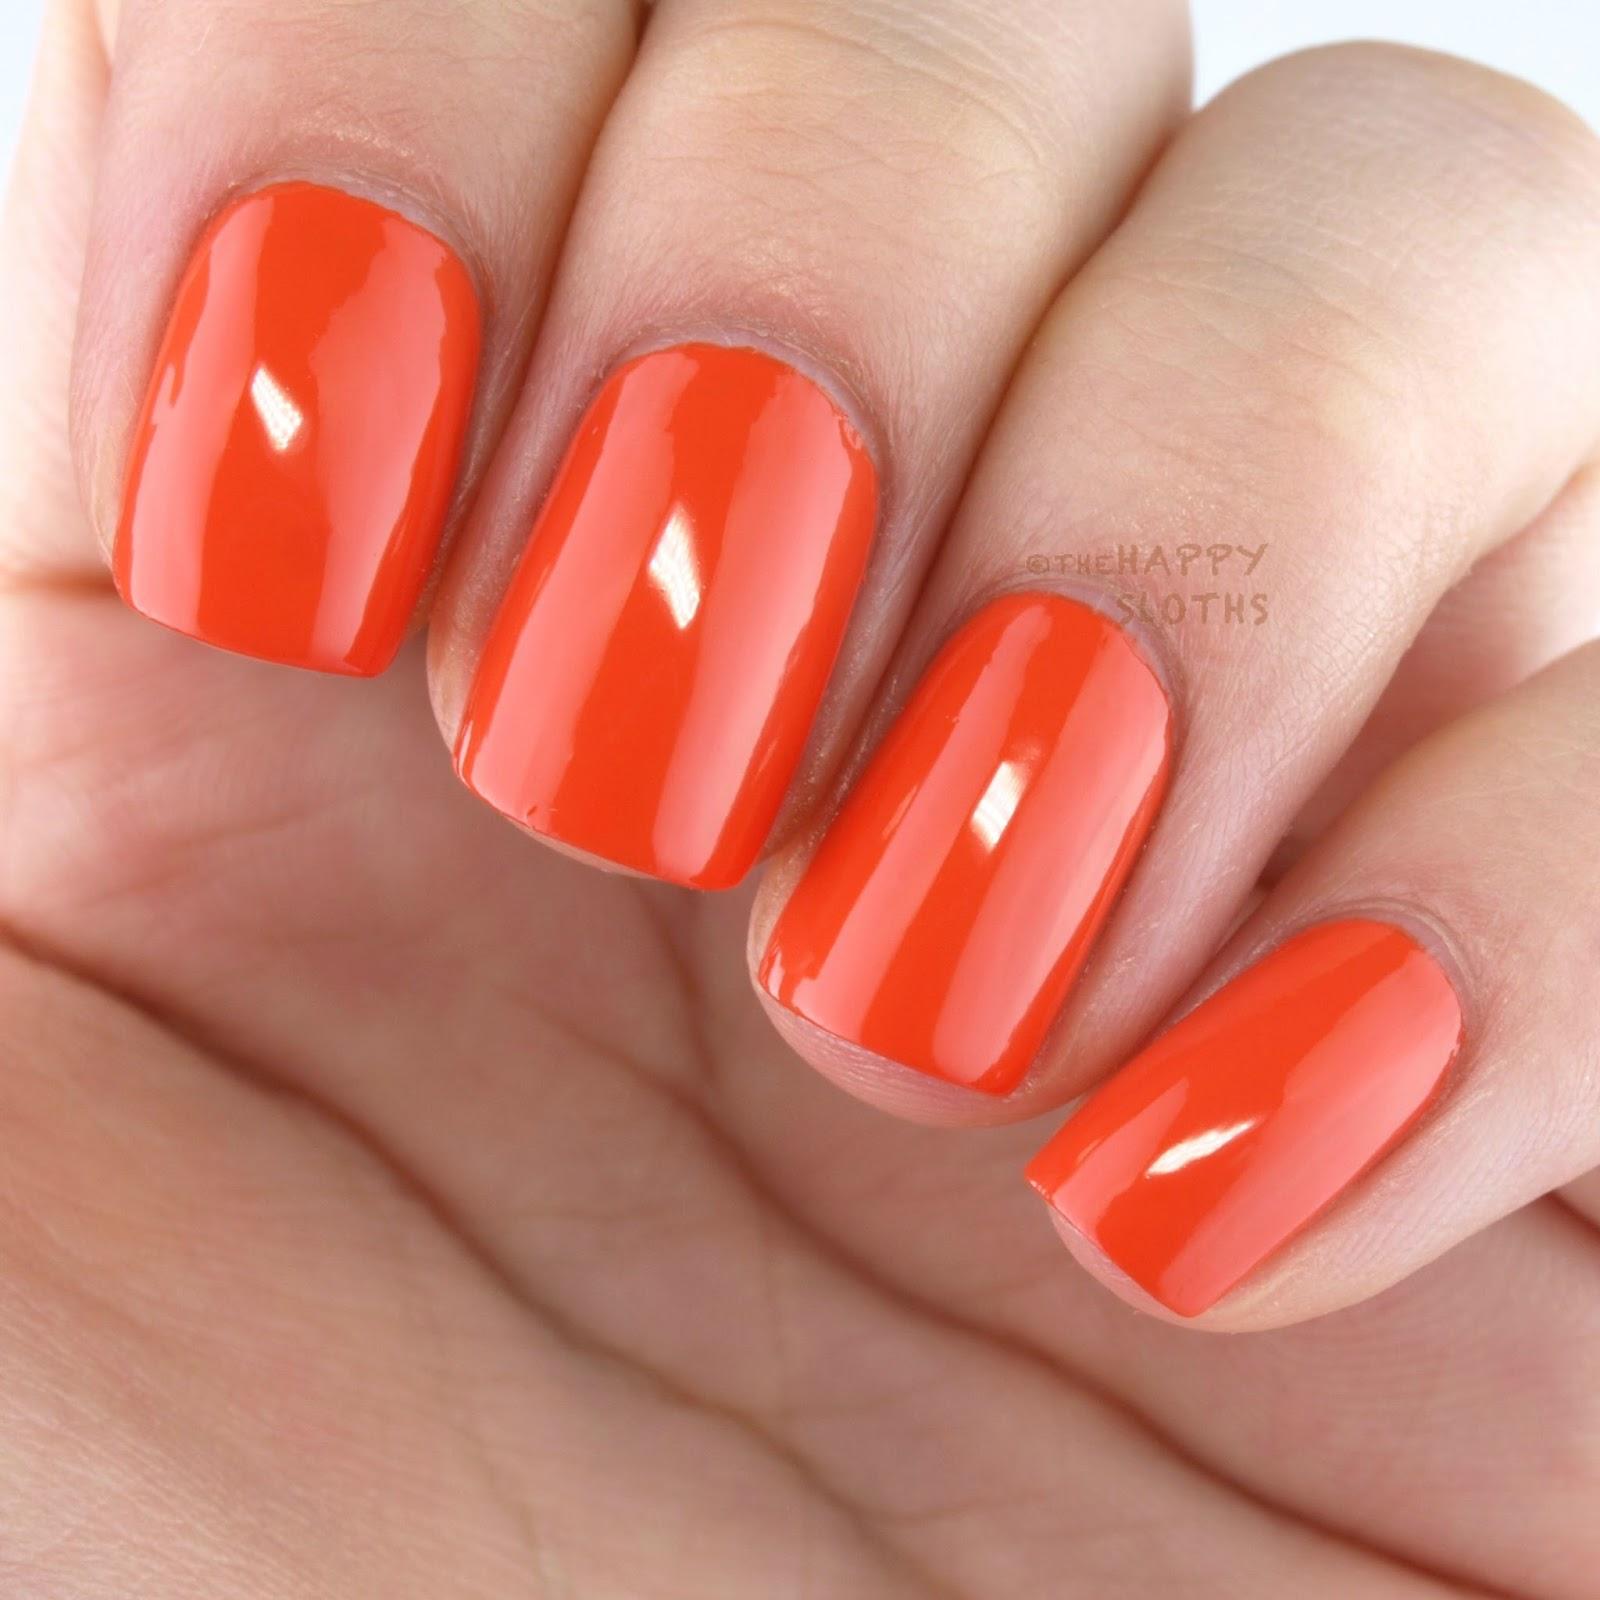 Nicole OPI The Look is Orange Swatches